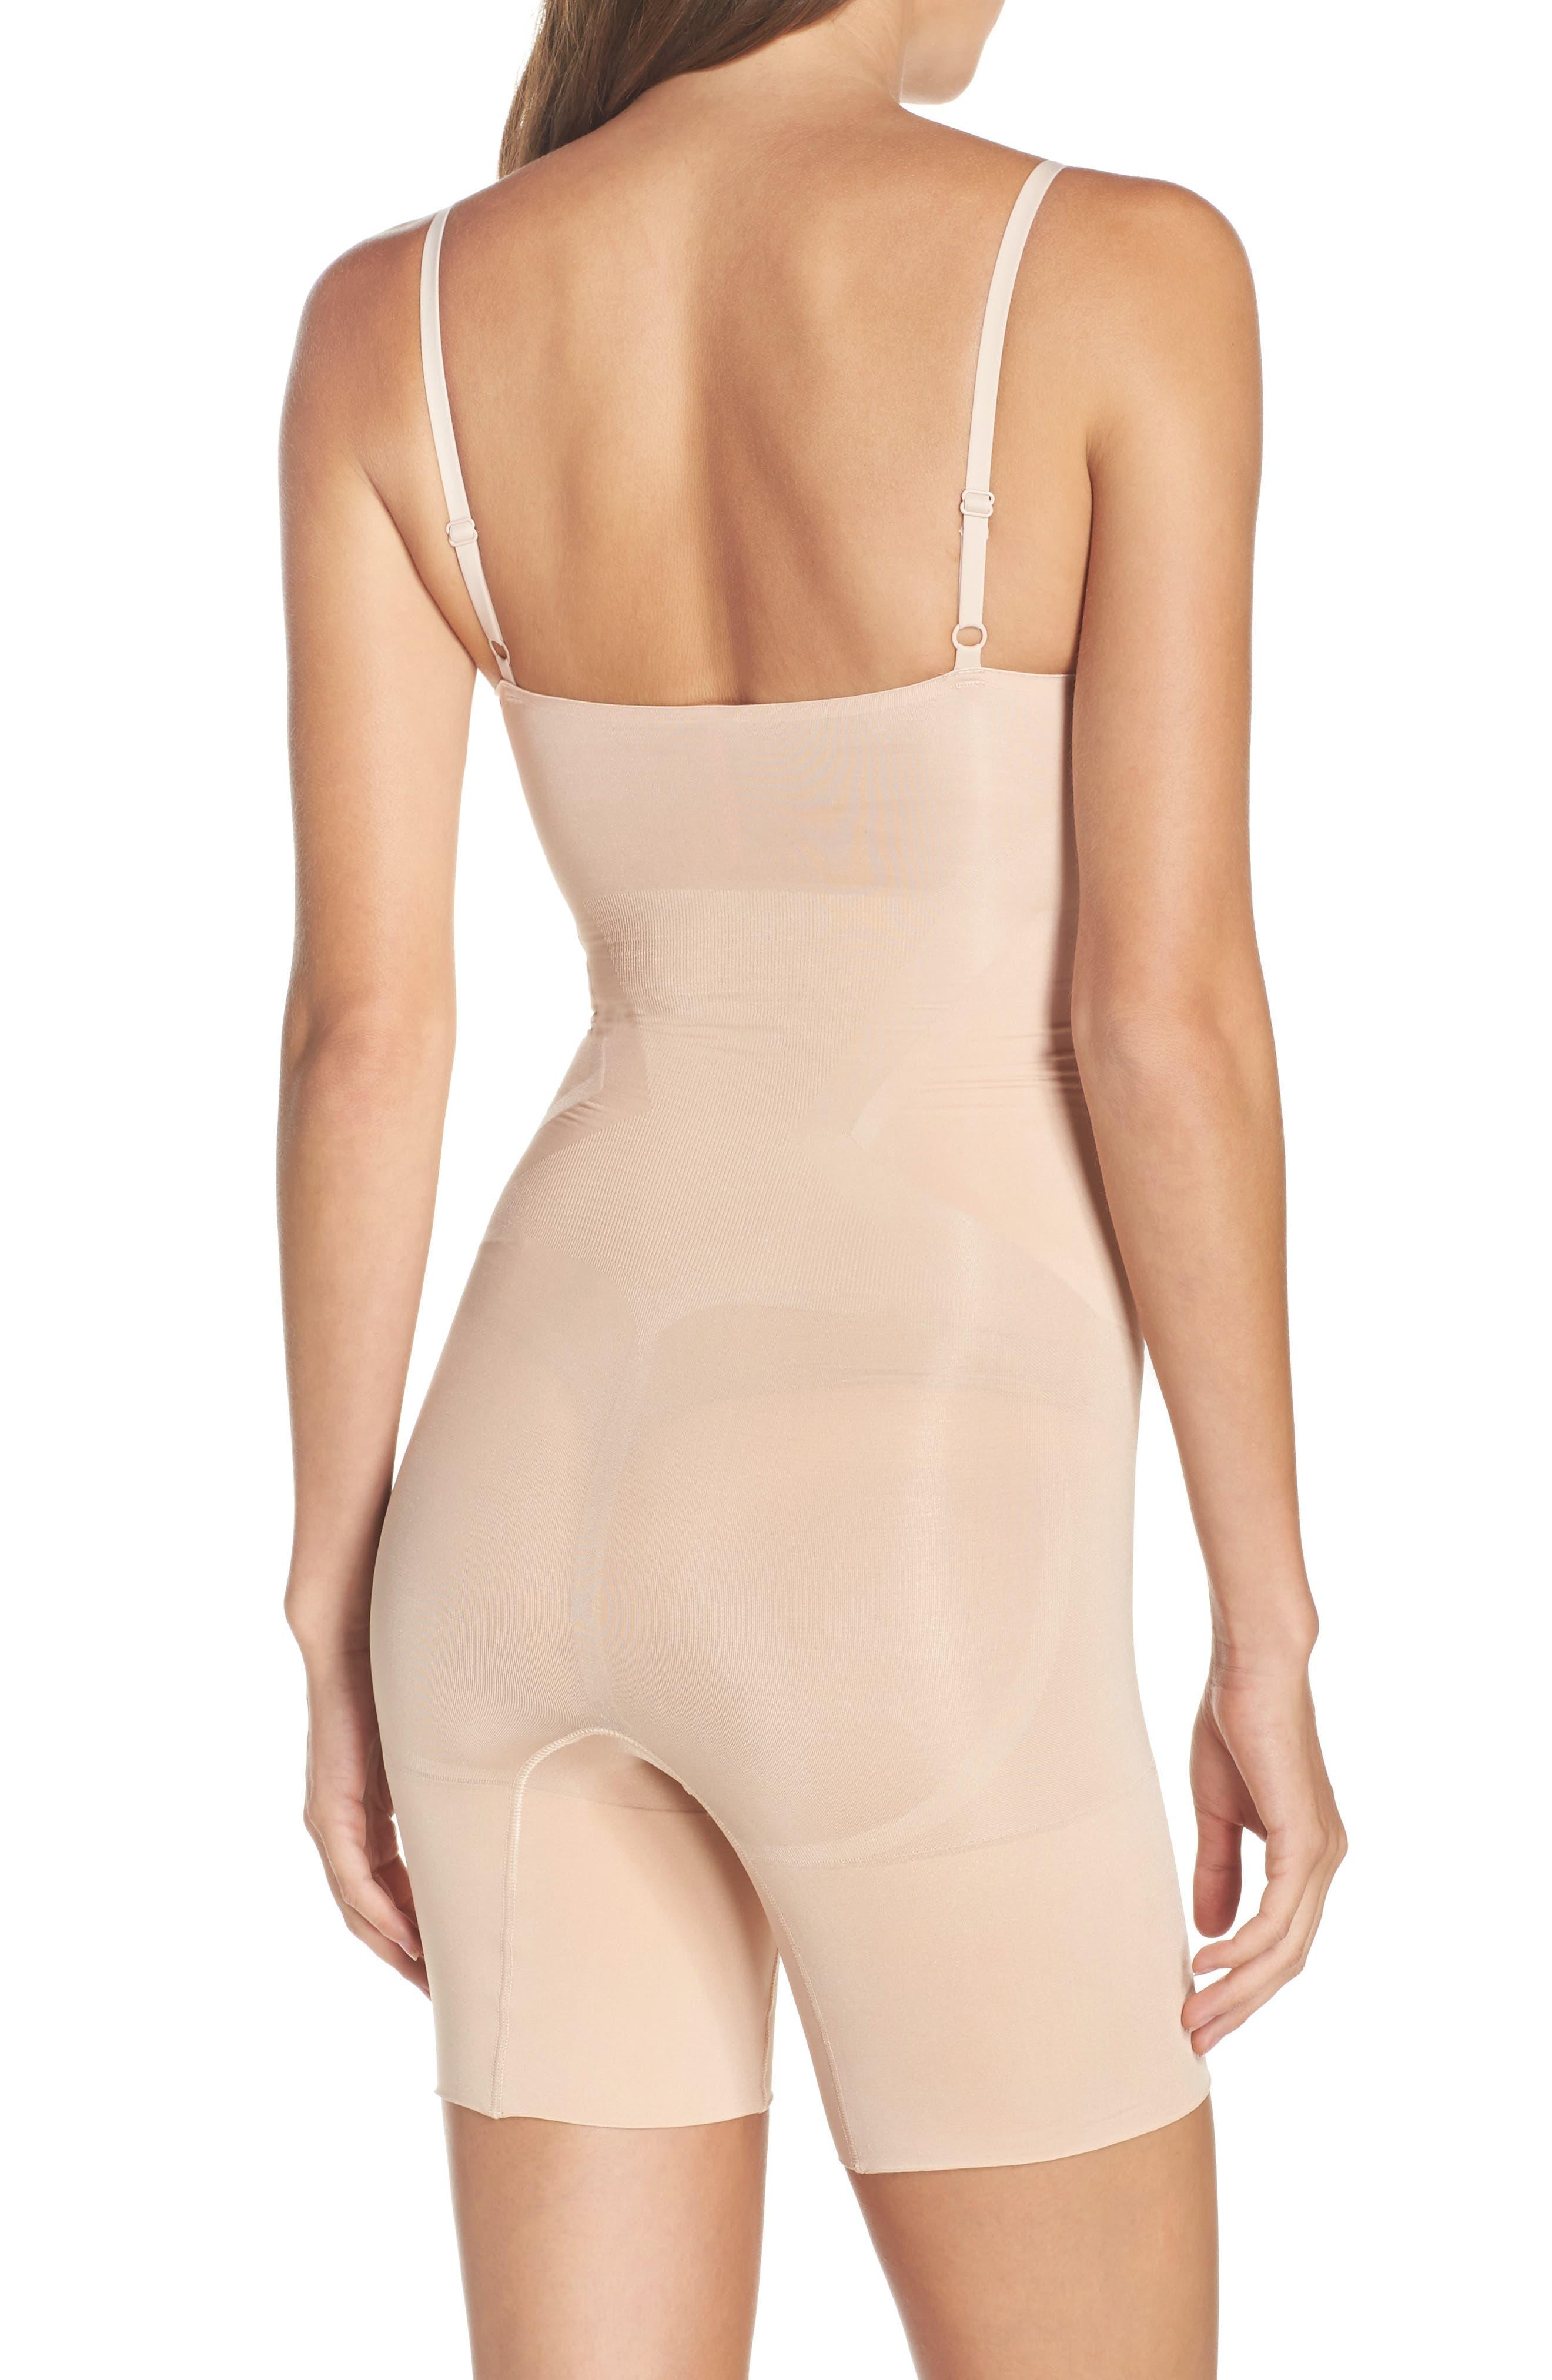 Women's Bodysuits Clothing | Nordstrom